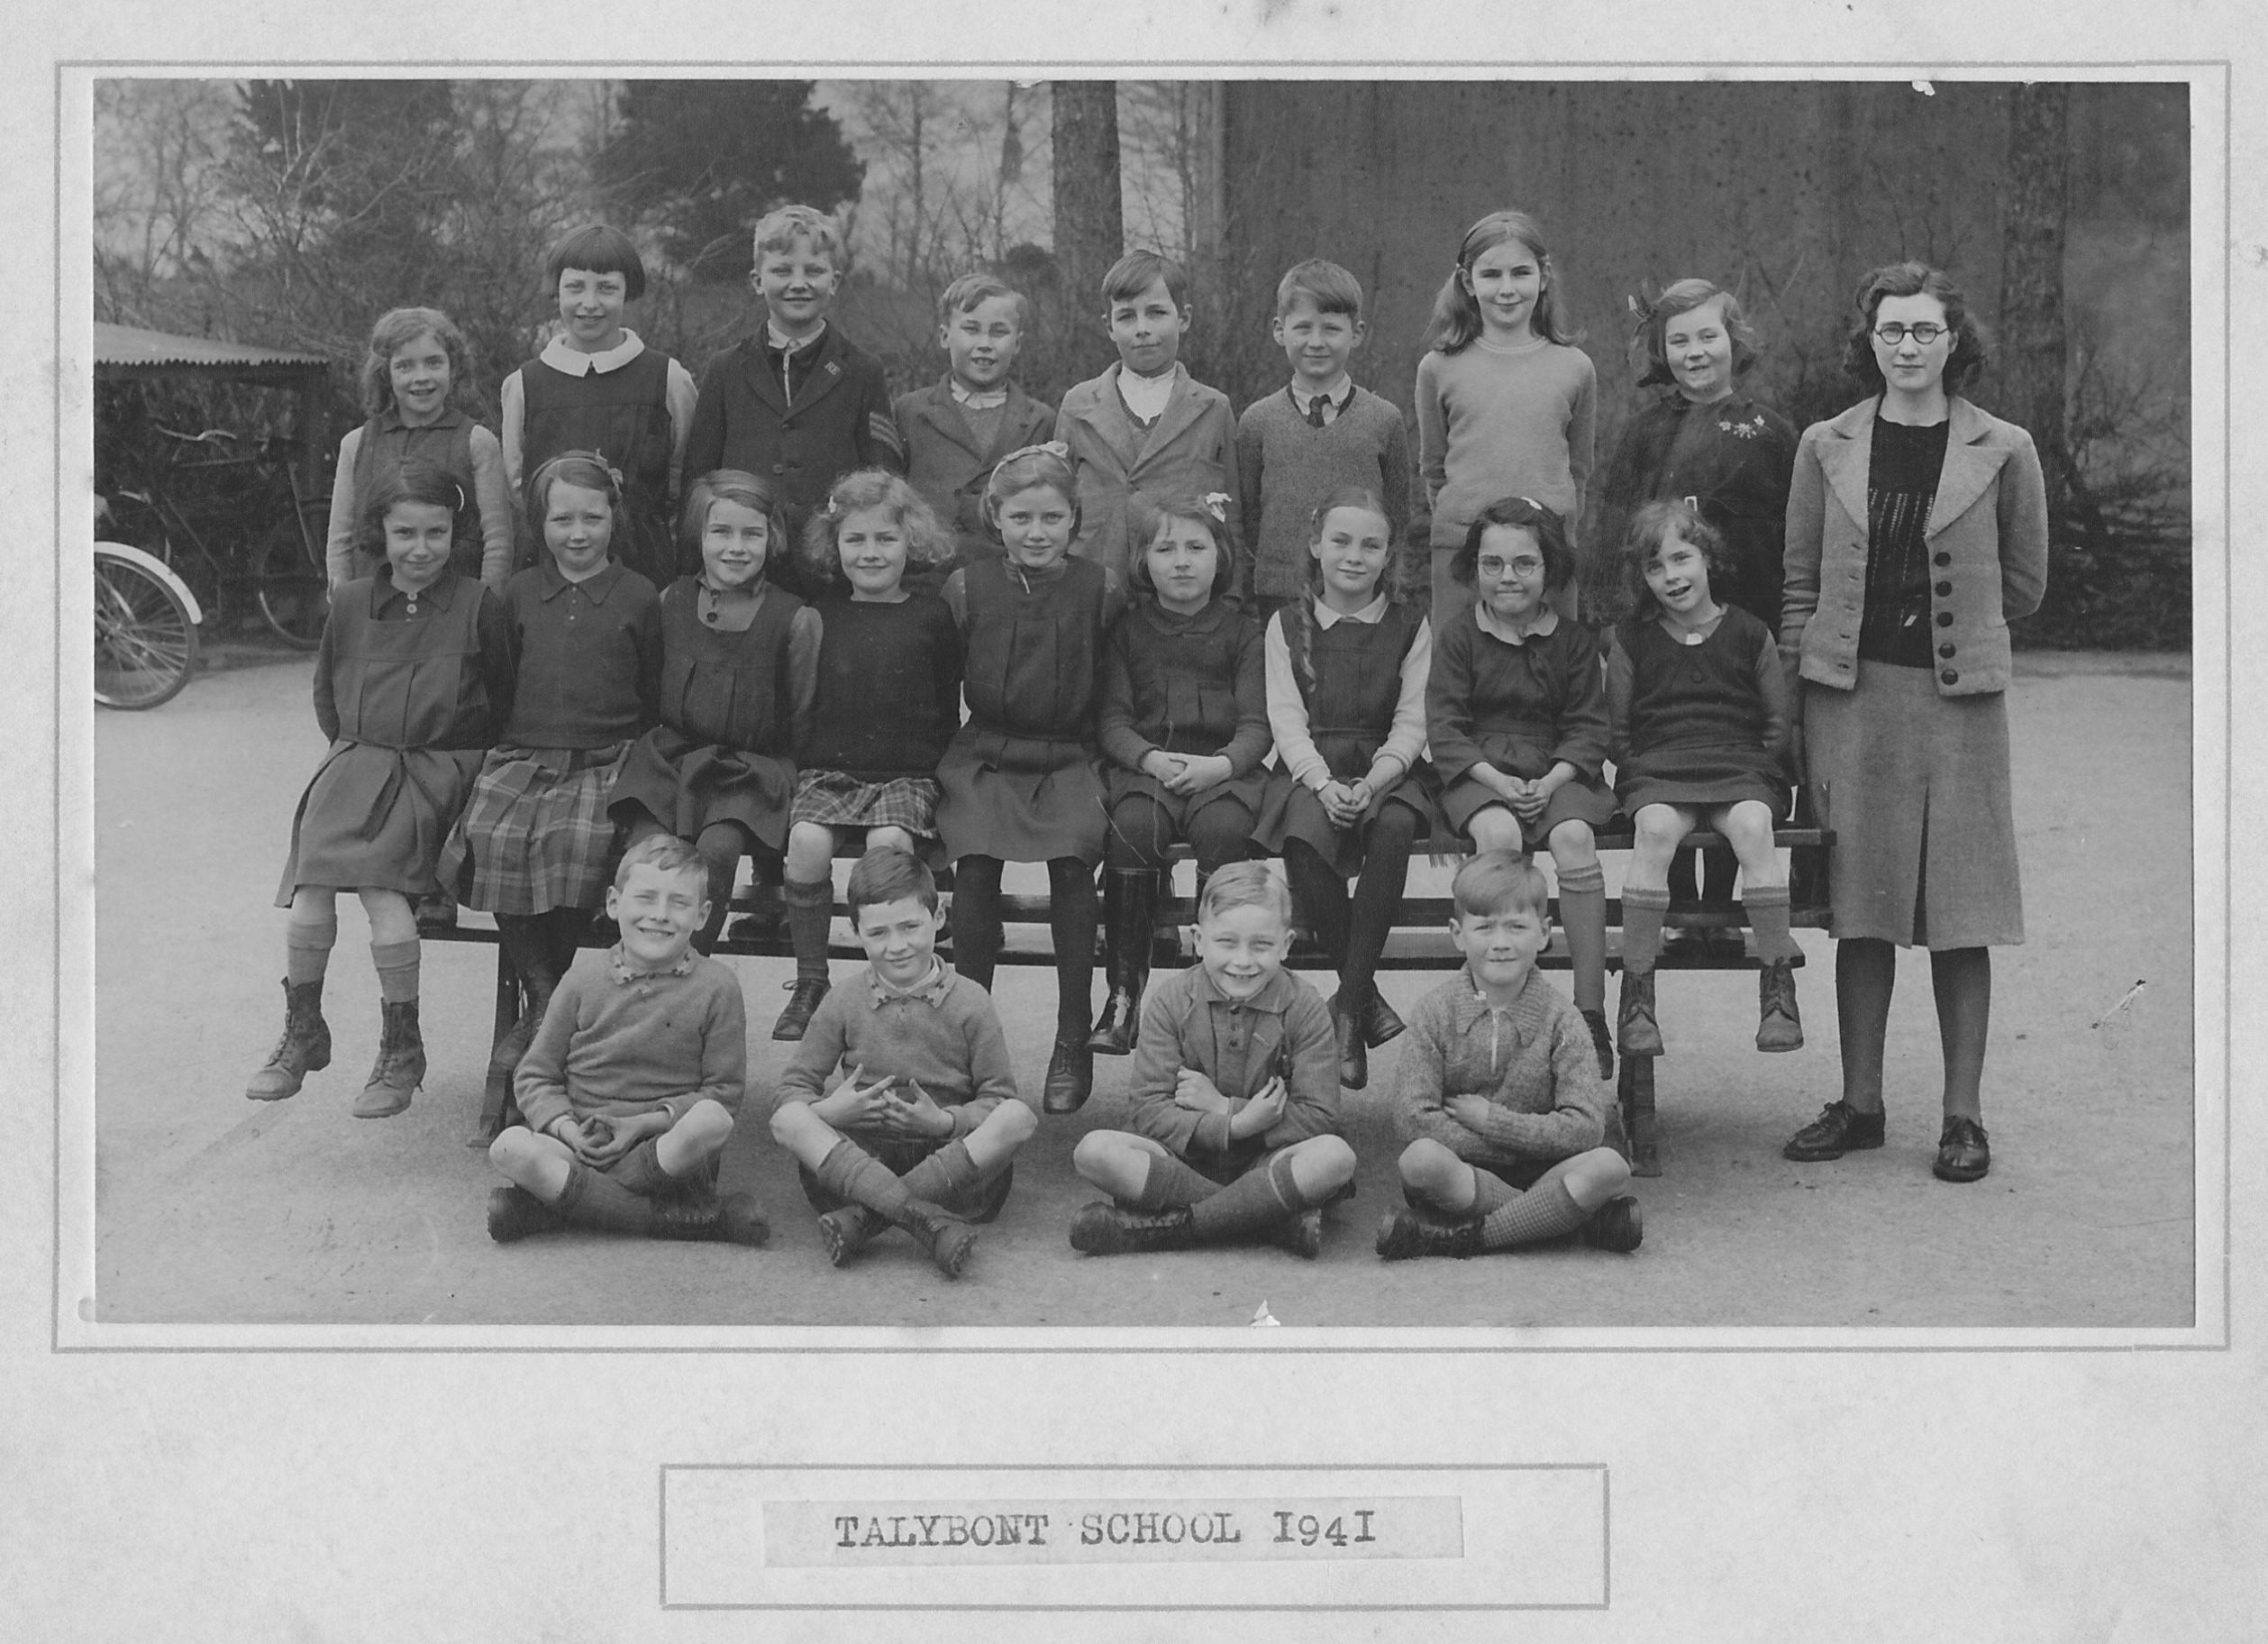 Talybont School 1941